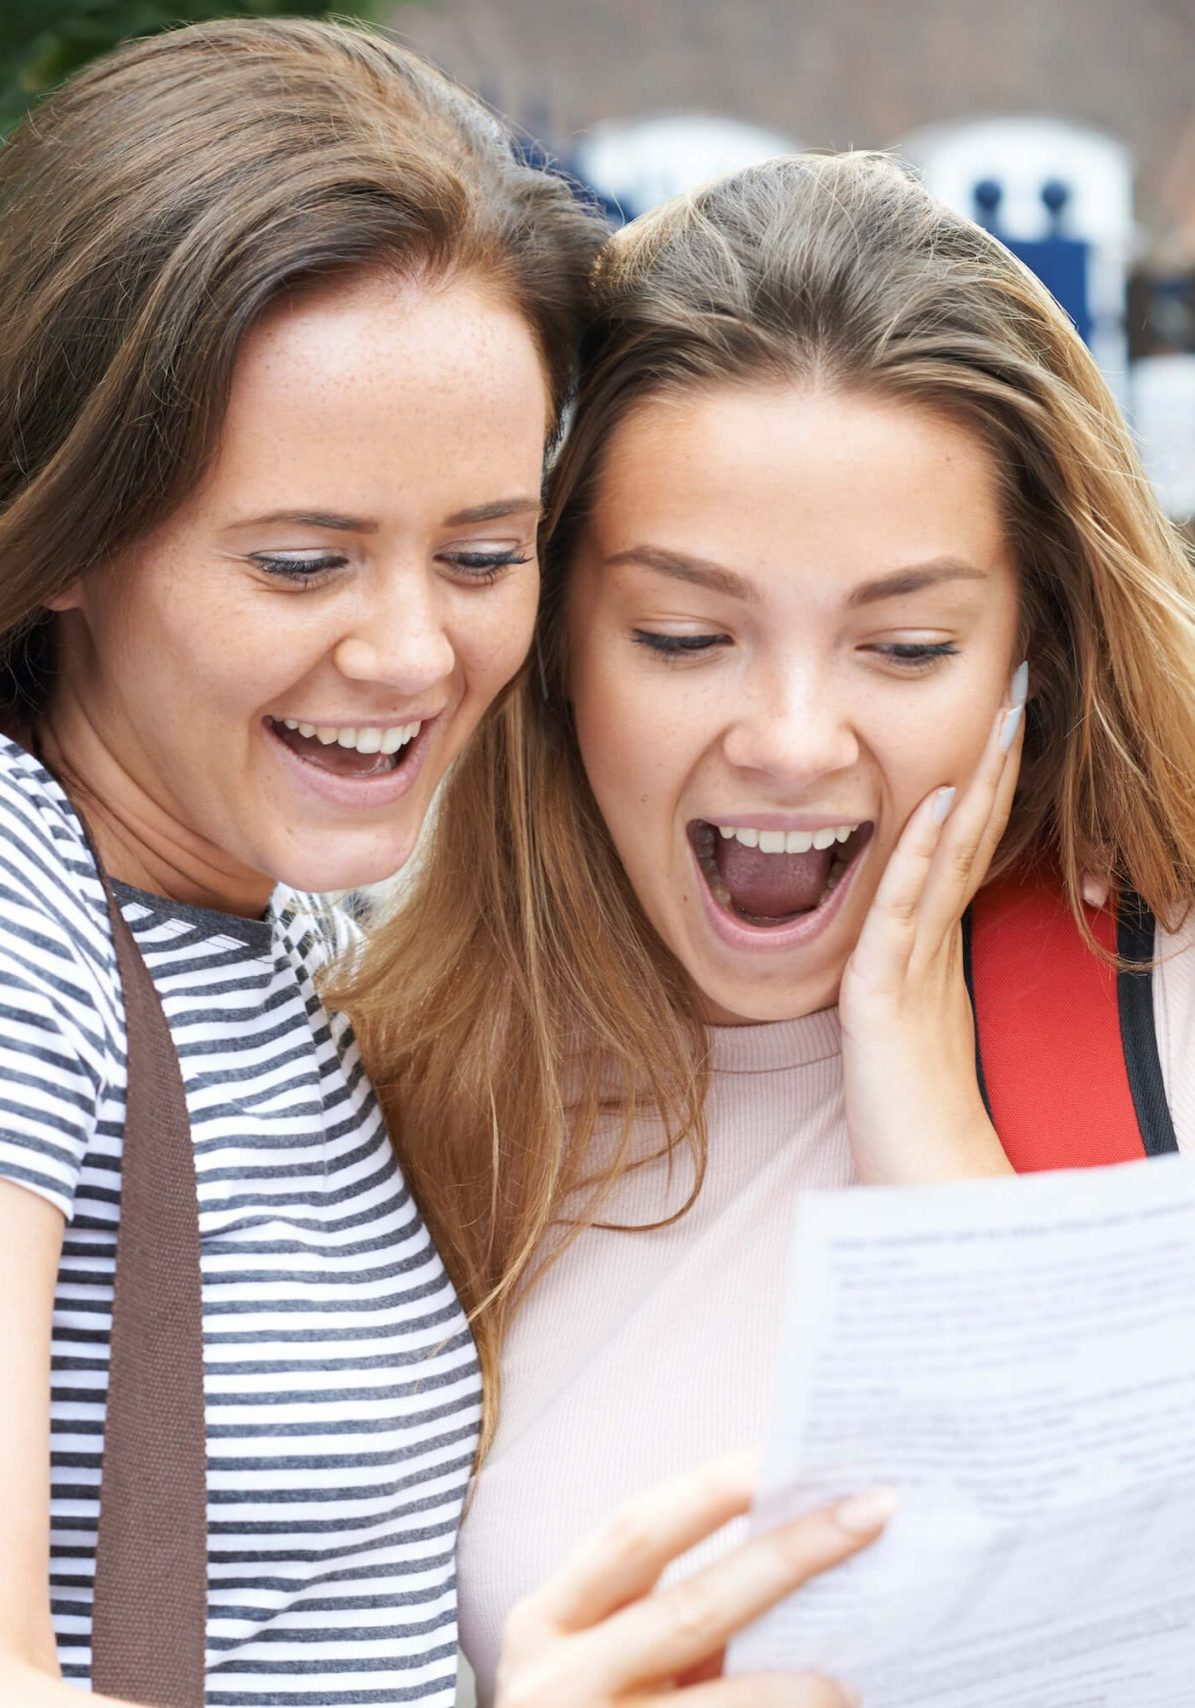 real-estate-salesperson-broker-license-exam-crash-course